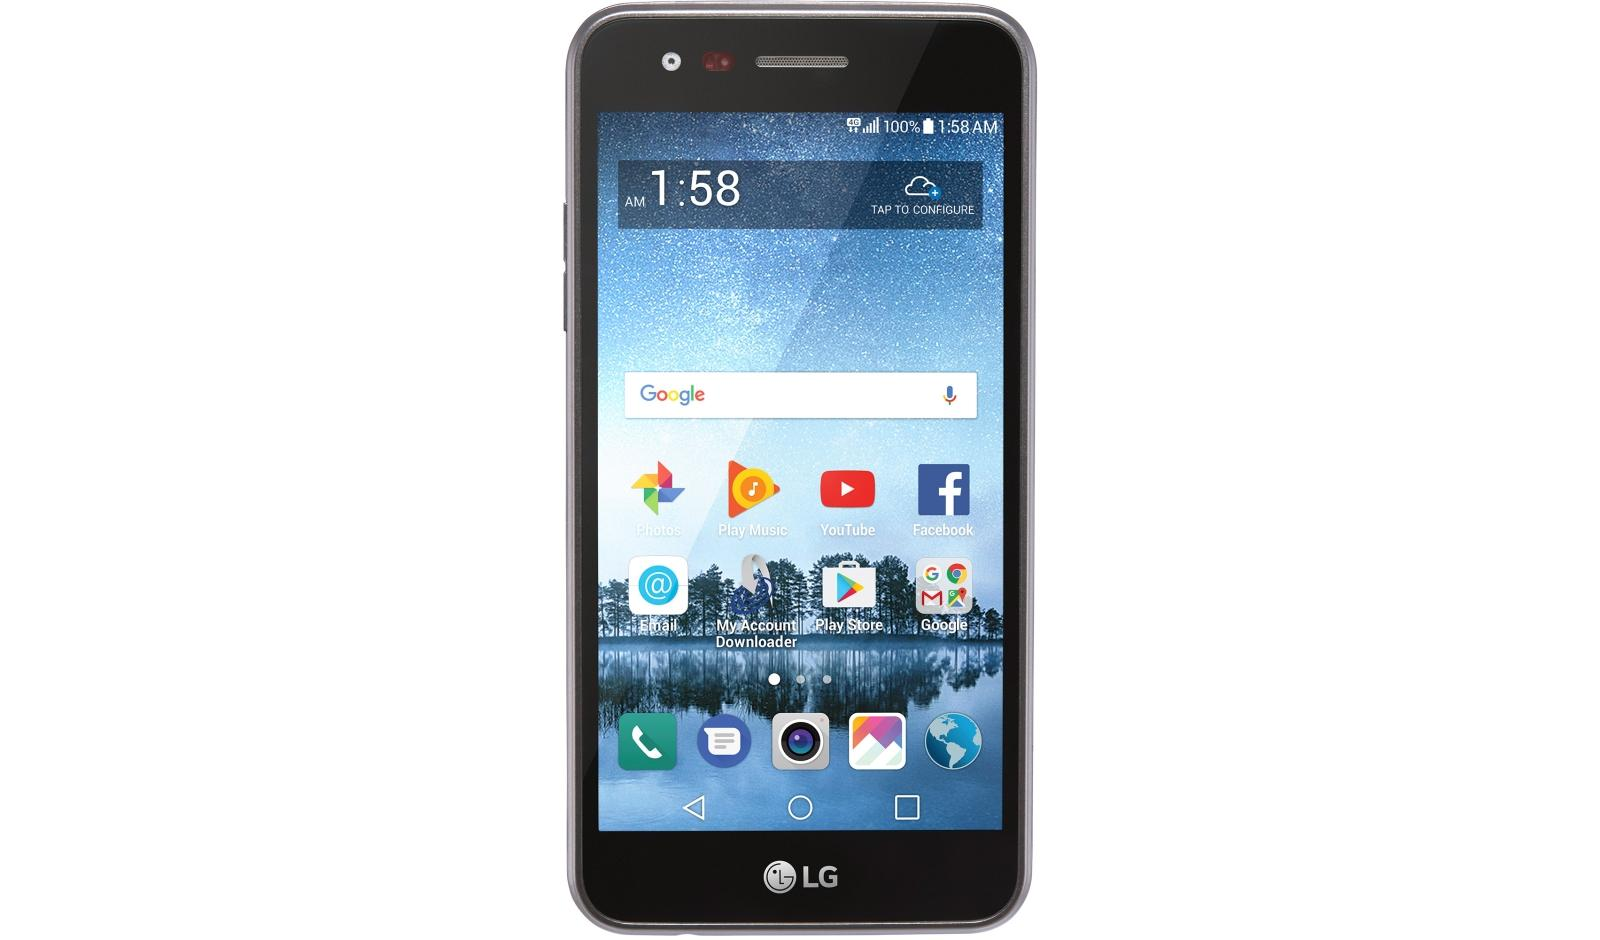 LG Rebel 3 LTE CDMA Smartphone for TracFone | LG USA